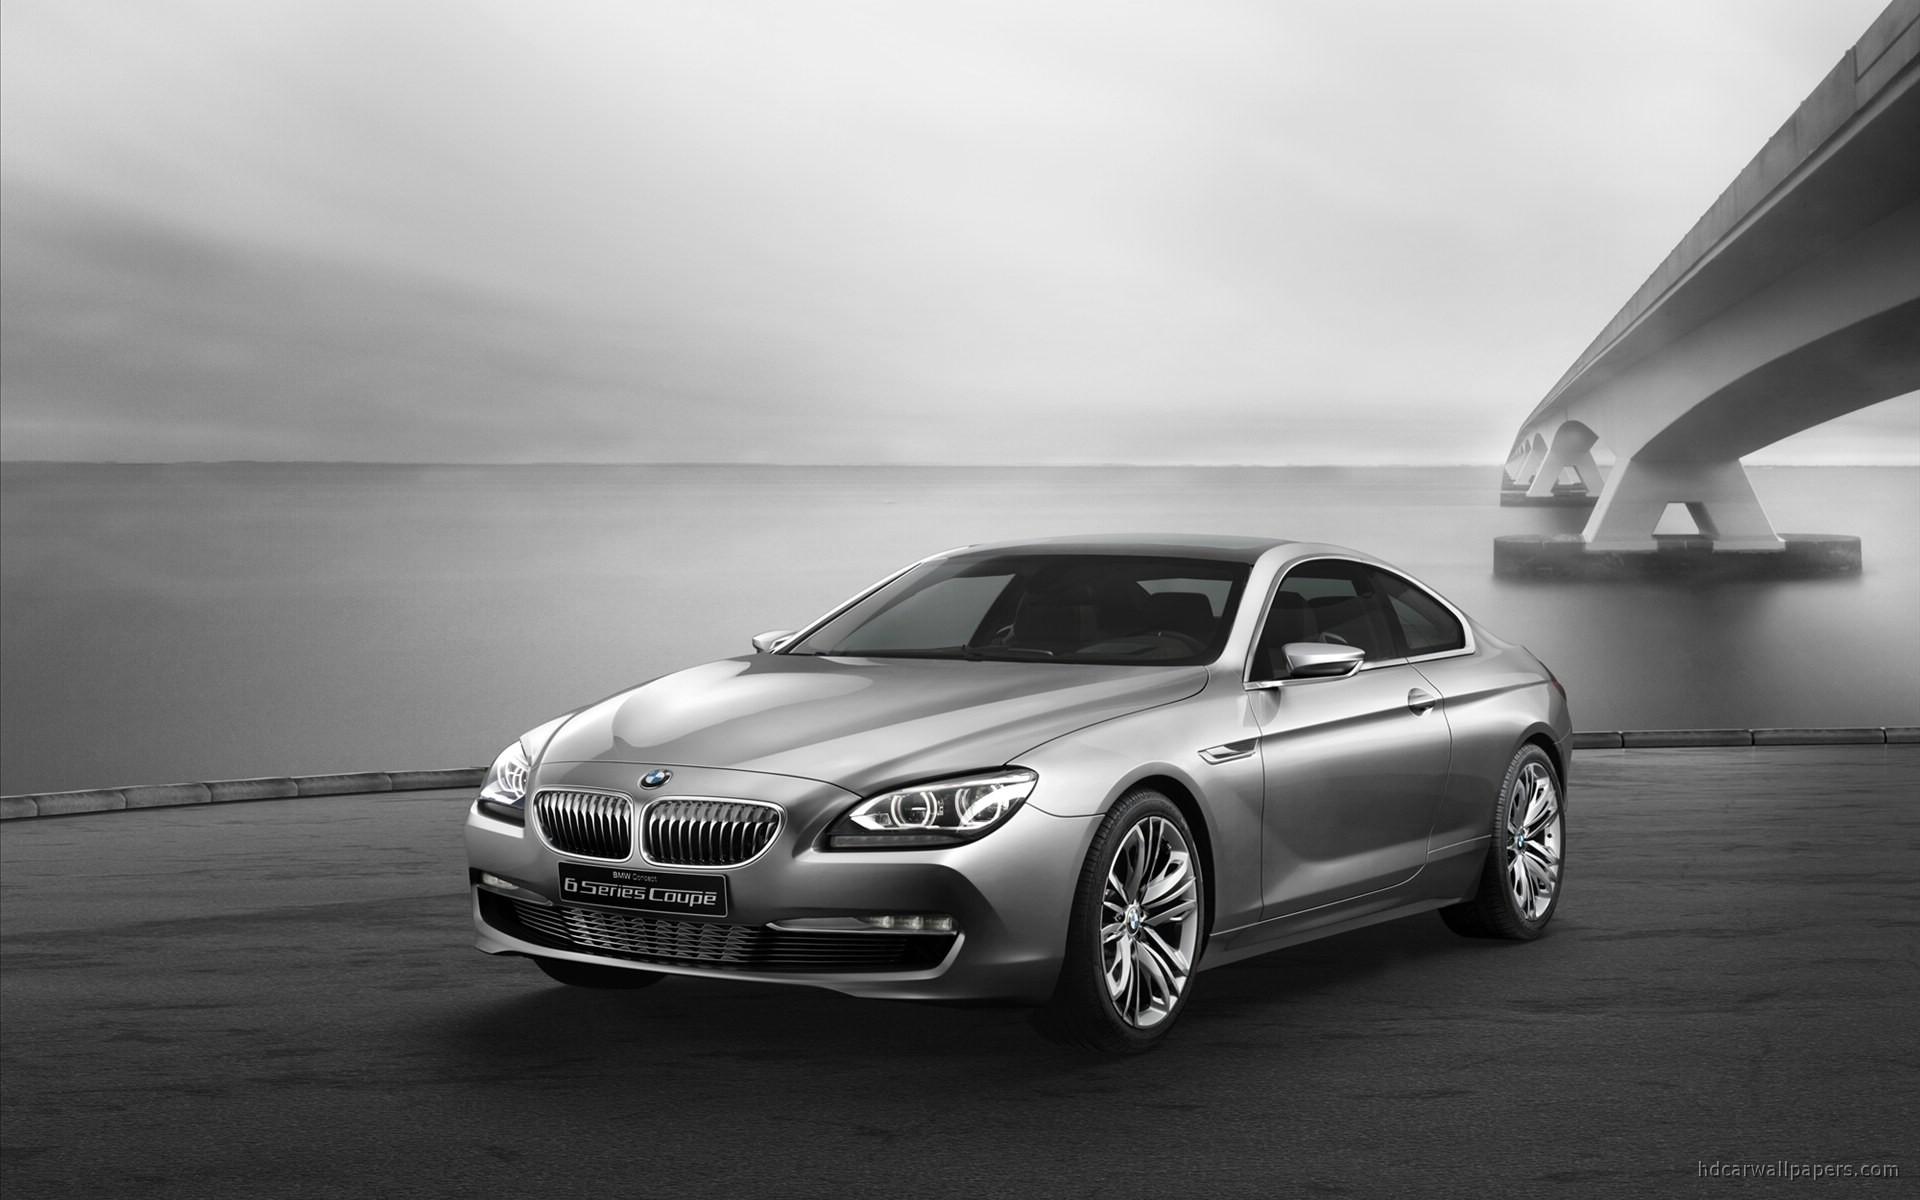 2010 BMW 6 Series Concept Wallpaper   HD Car Wallpapers ...